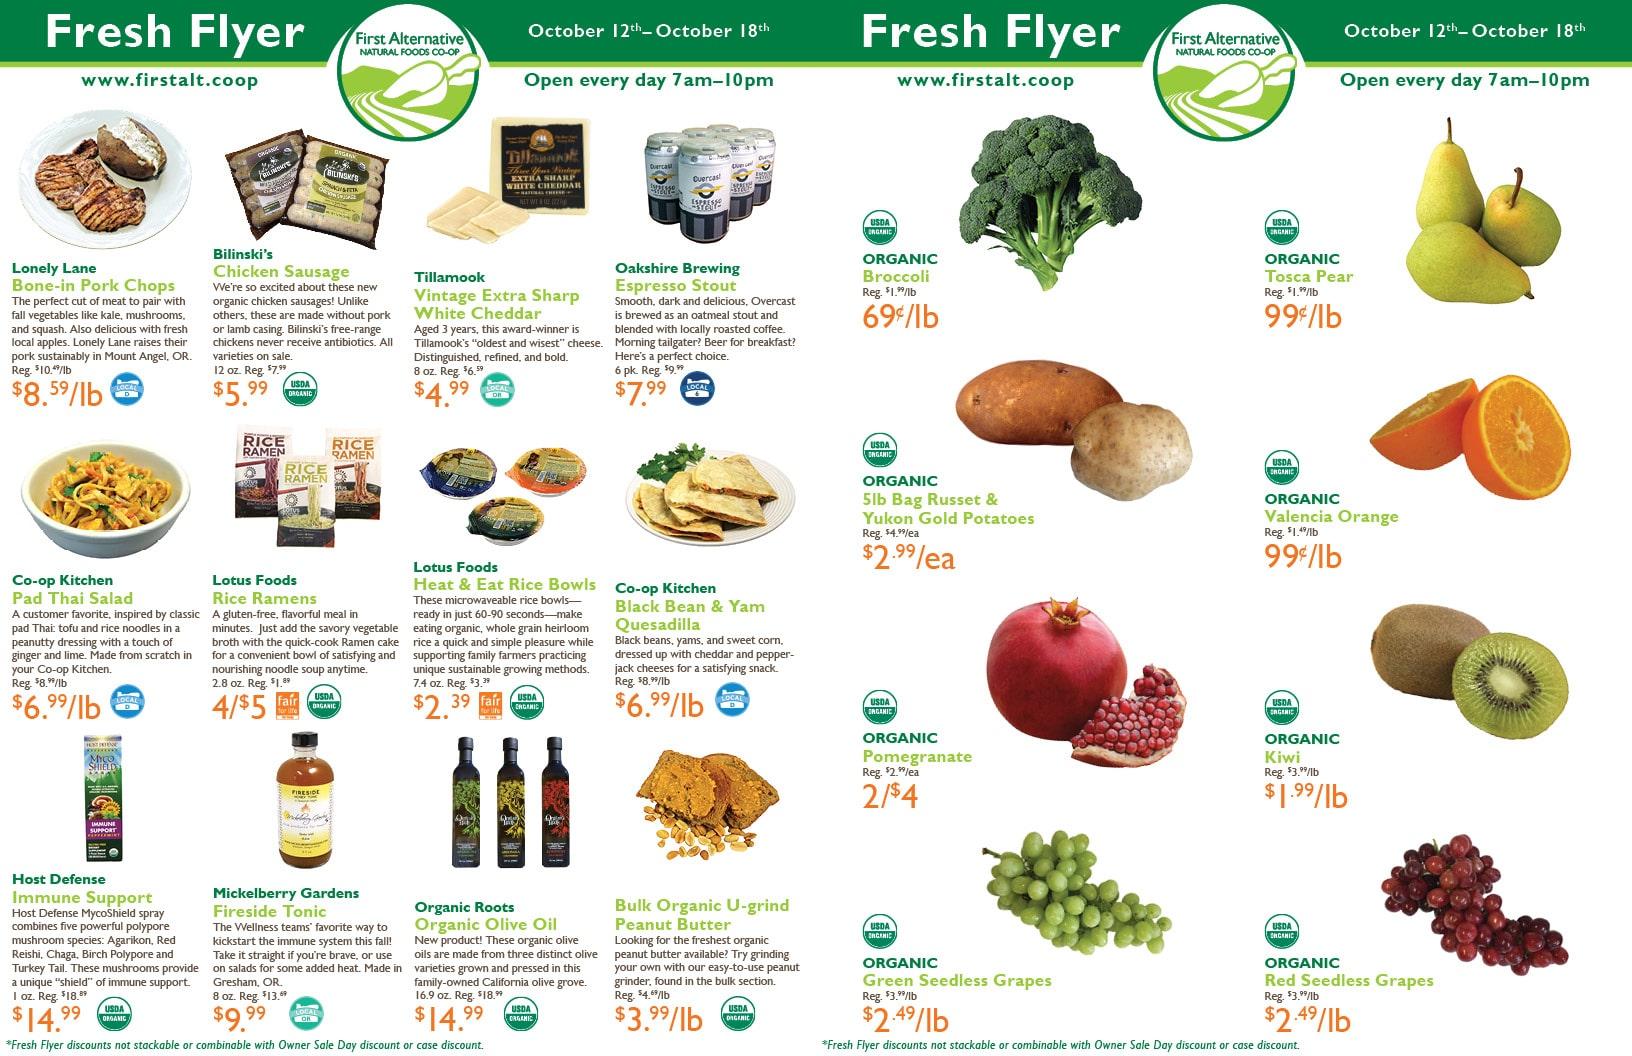 first alternative fresh flyer oct 12-18